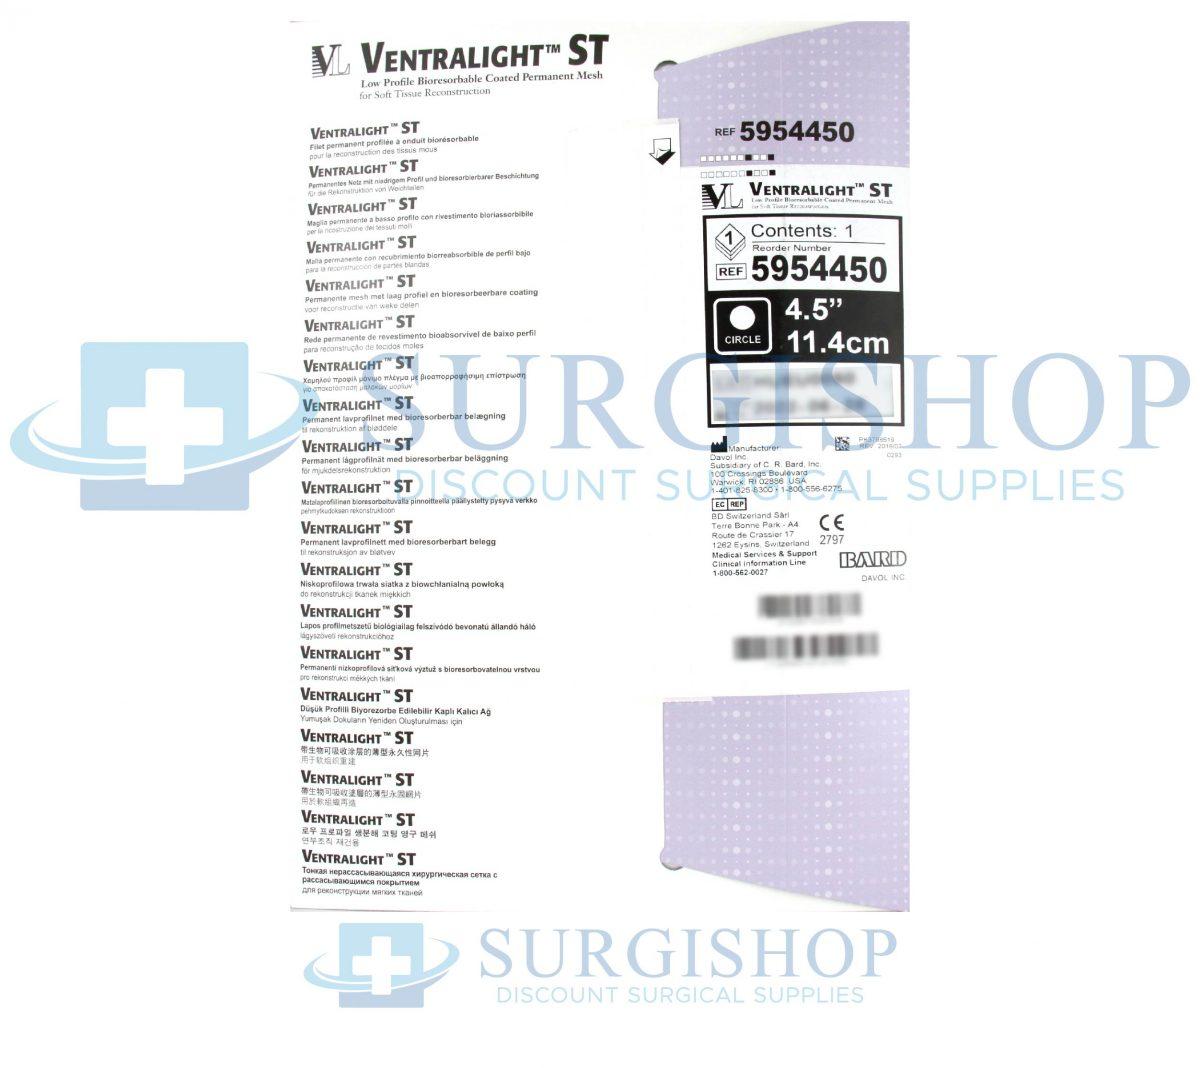 5954450 – Bard Ventralight ST Mesh: 4.5″ Circle Each